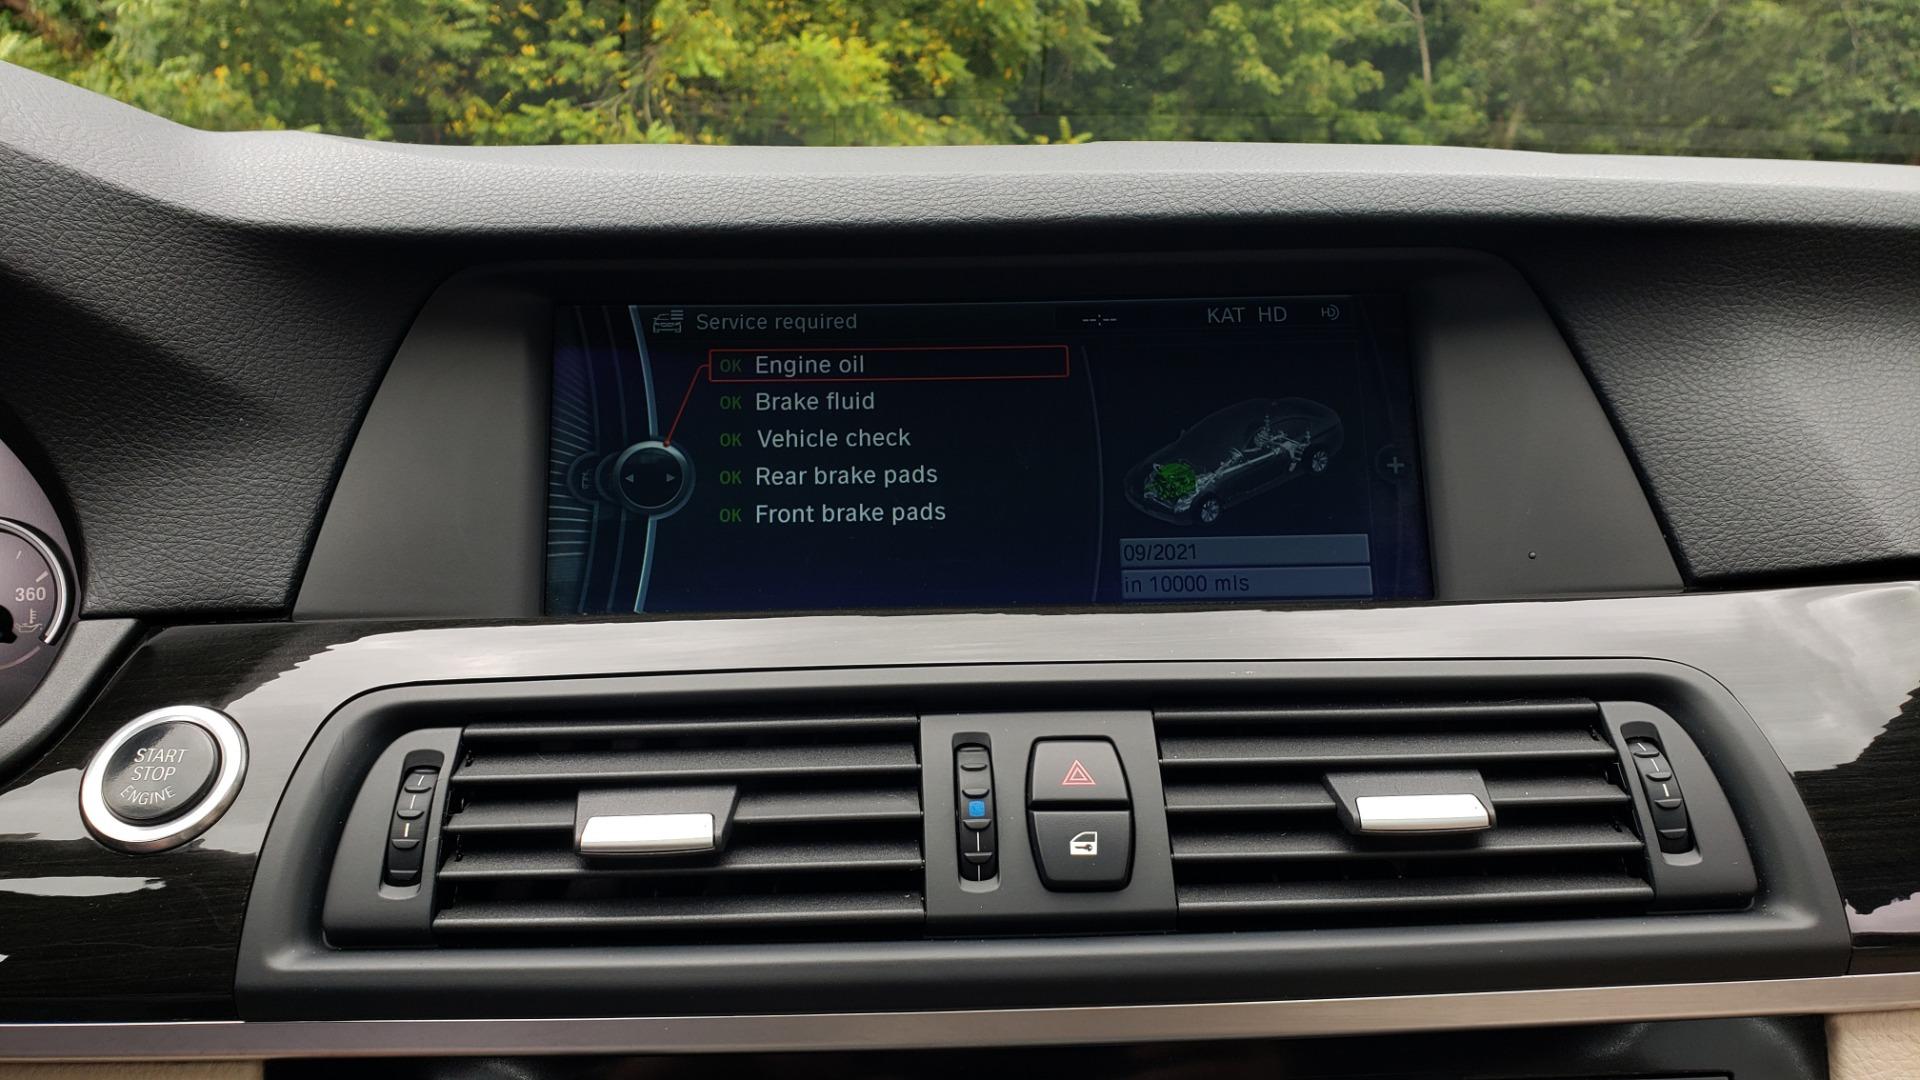 Used 2012 BMW 5 SERIES 550I M SPORT / NAV / CONV PKG / SUNROOF / PREM SND / REARVIEW for sale Sold at Formula Imports in Charlotte NC 28227 37